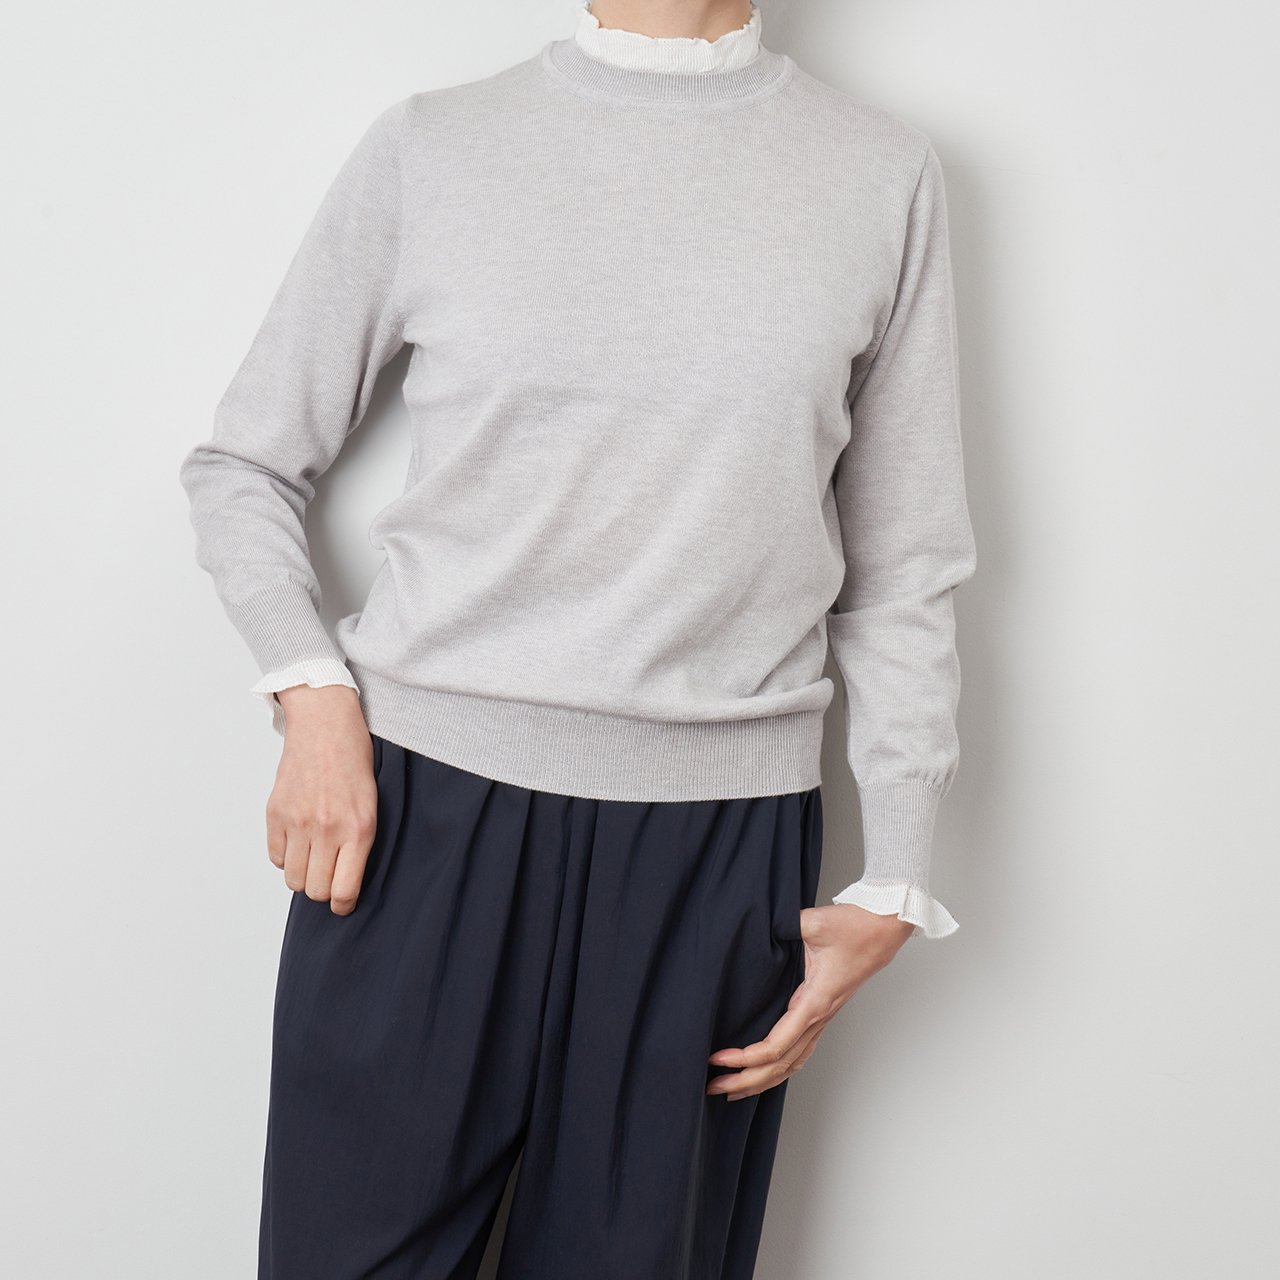 Pale Jute <BR>White frill knit P/O<BR>PaleJute